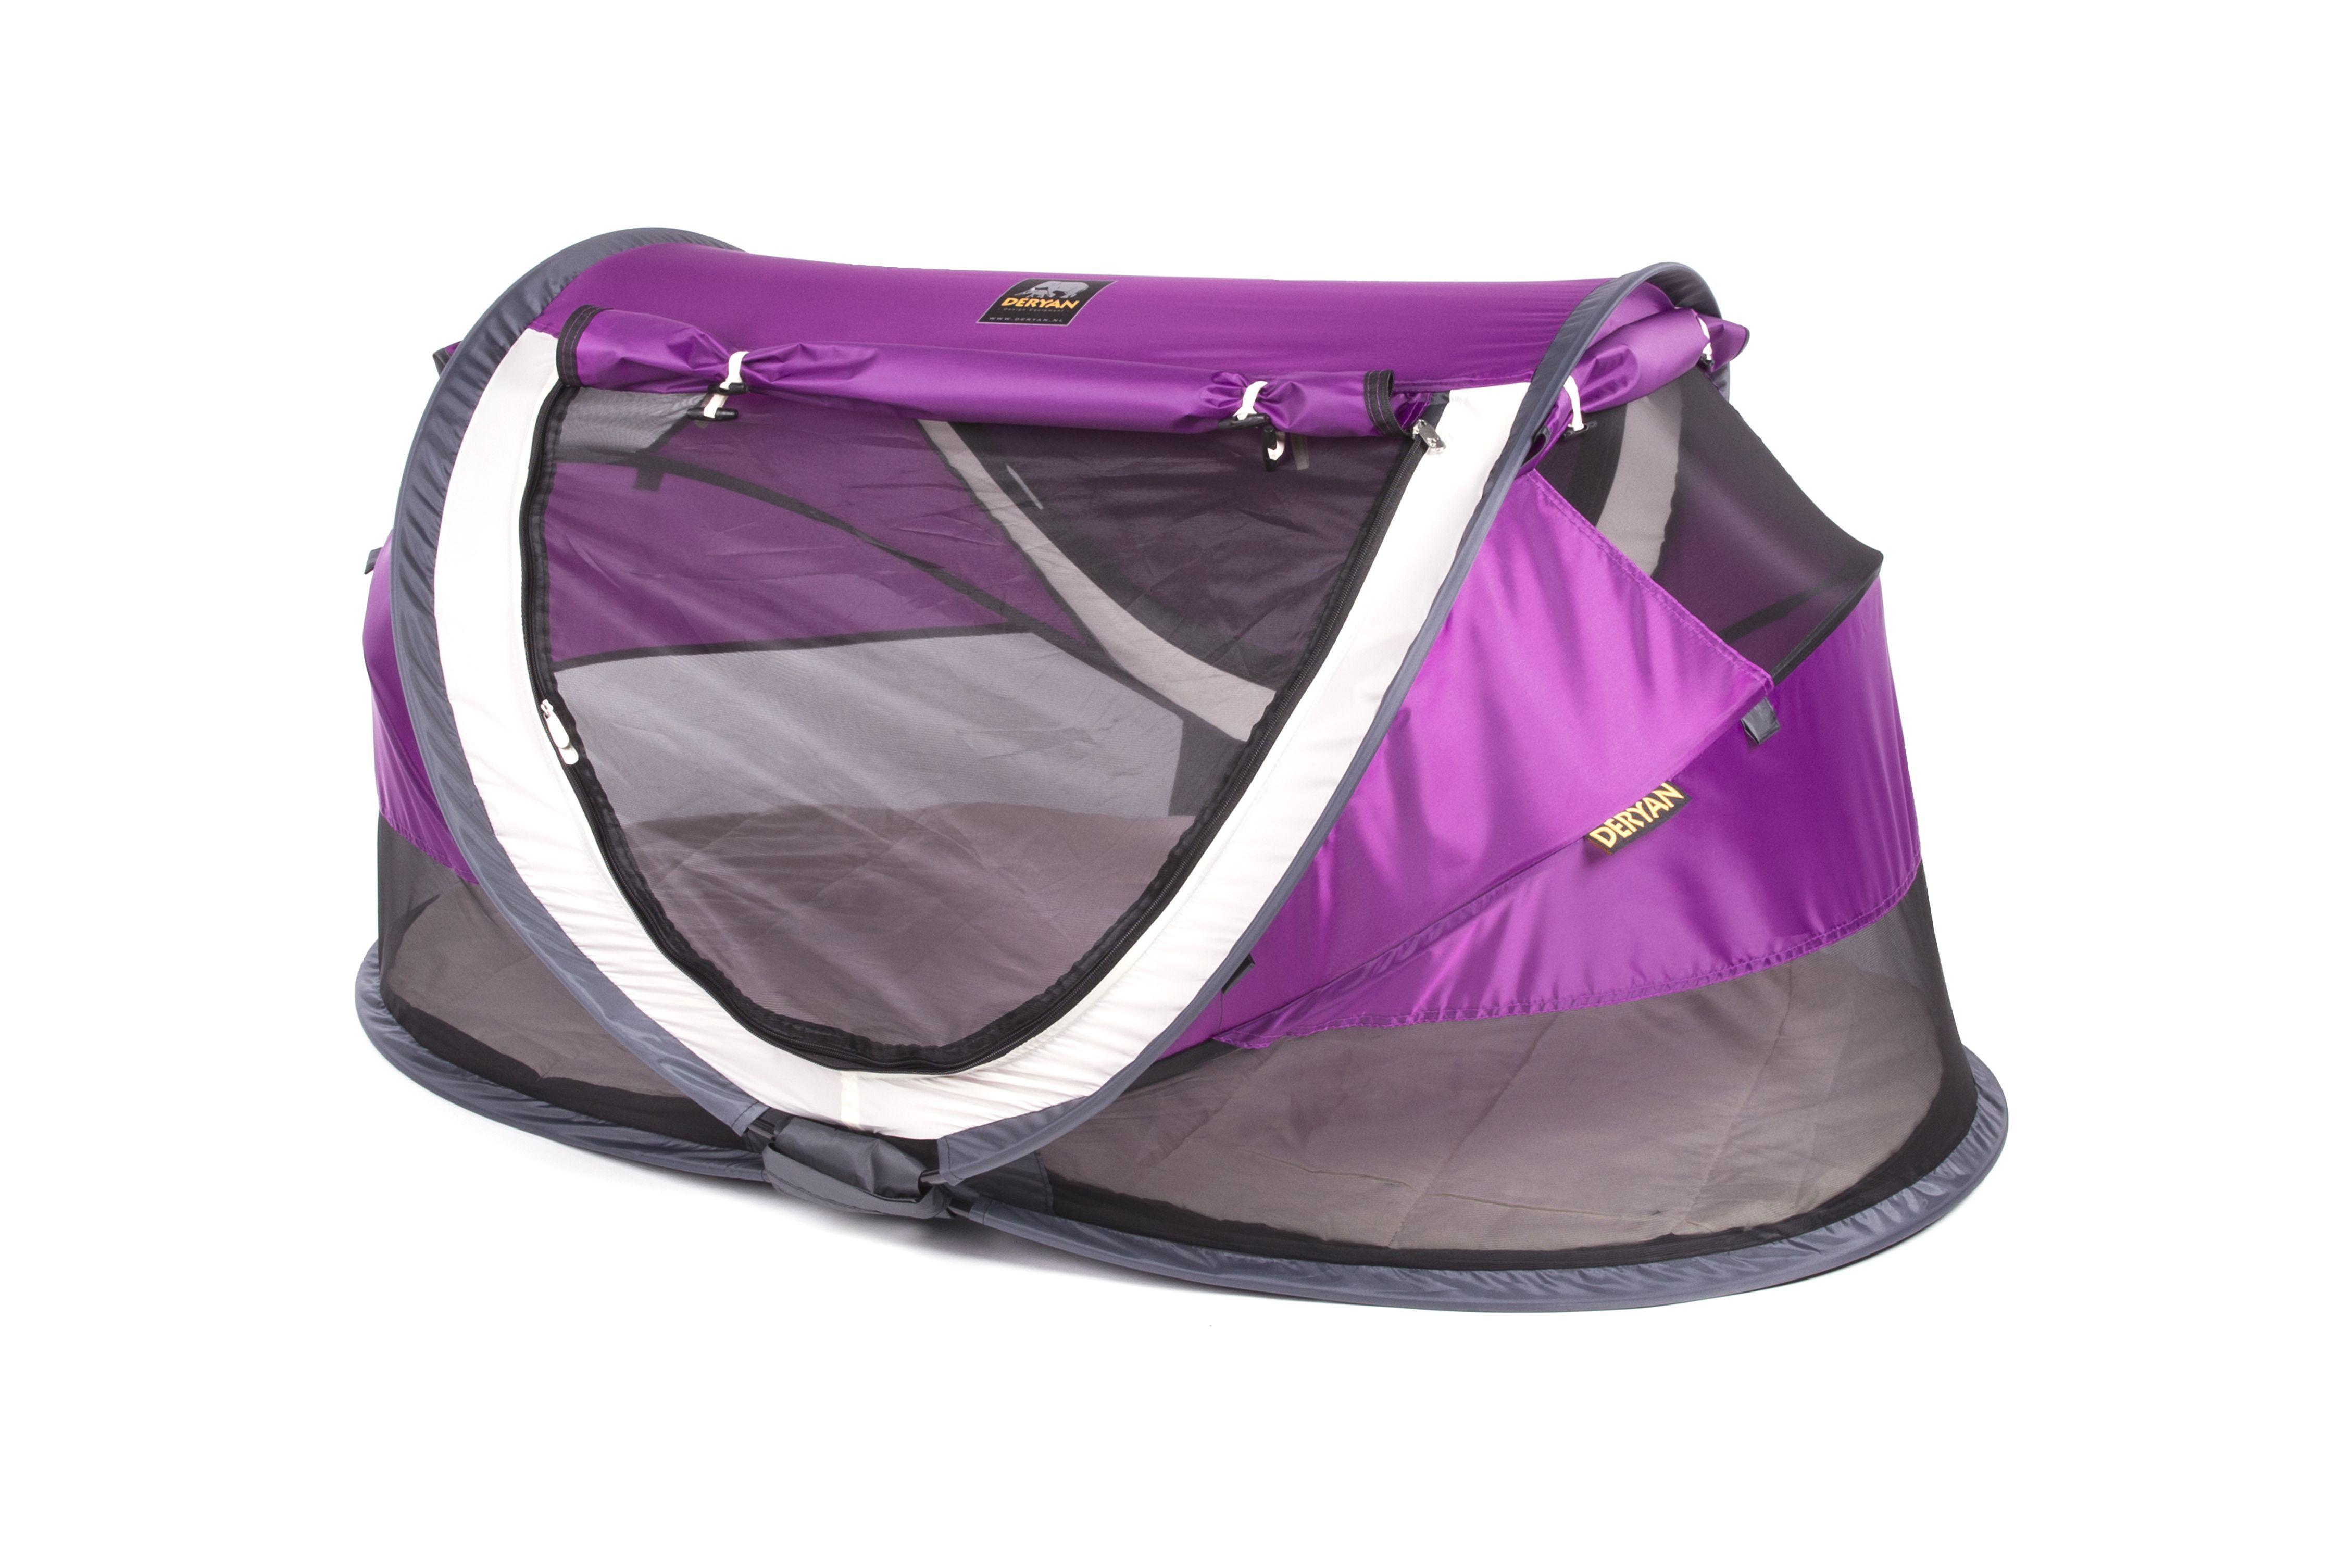 Deryan – Rejseseng fra  deryan - travel cot peuter luxe - purple fra babygear.dk